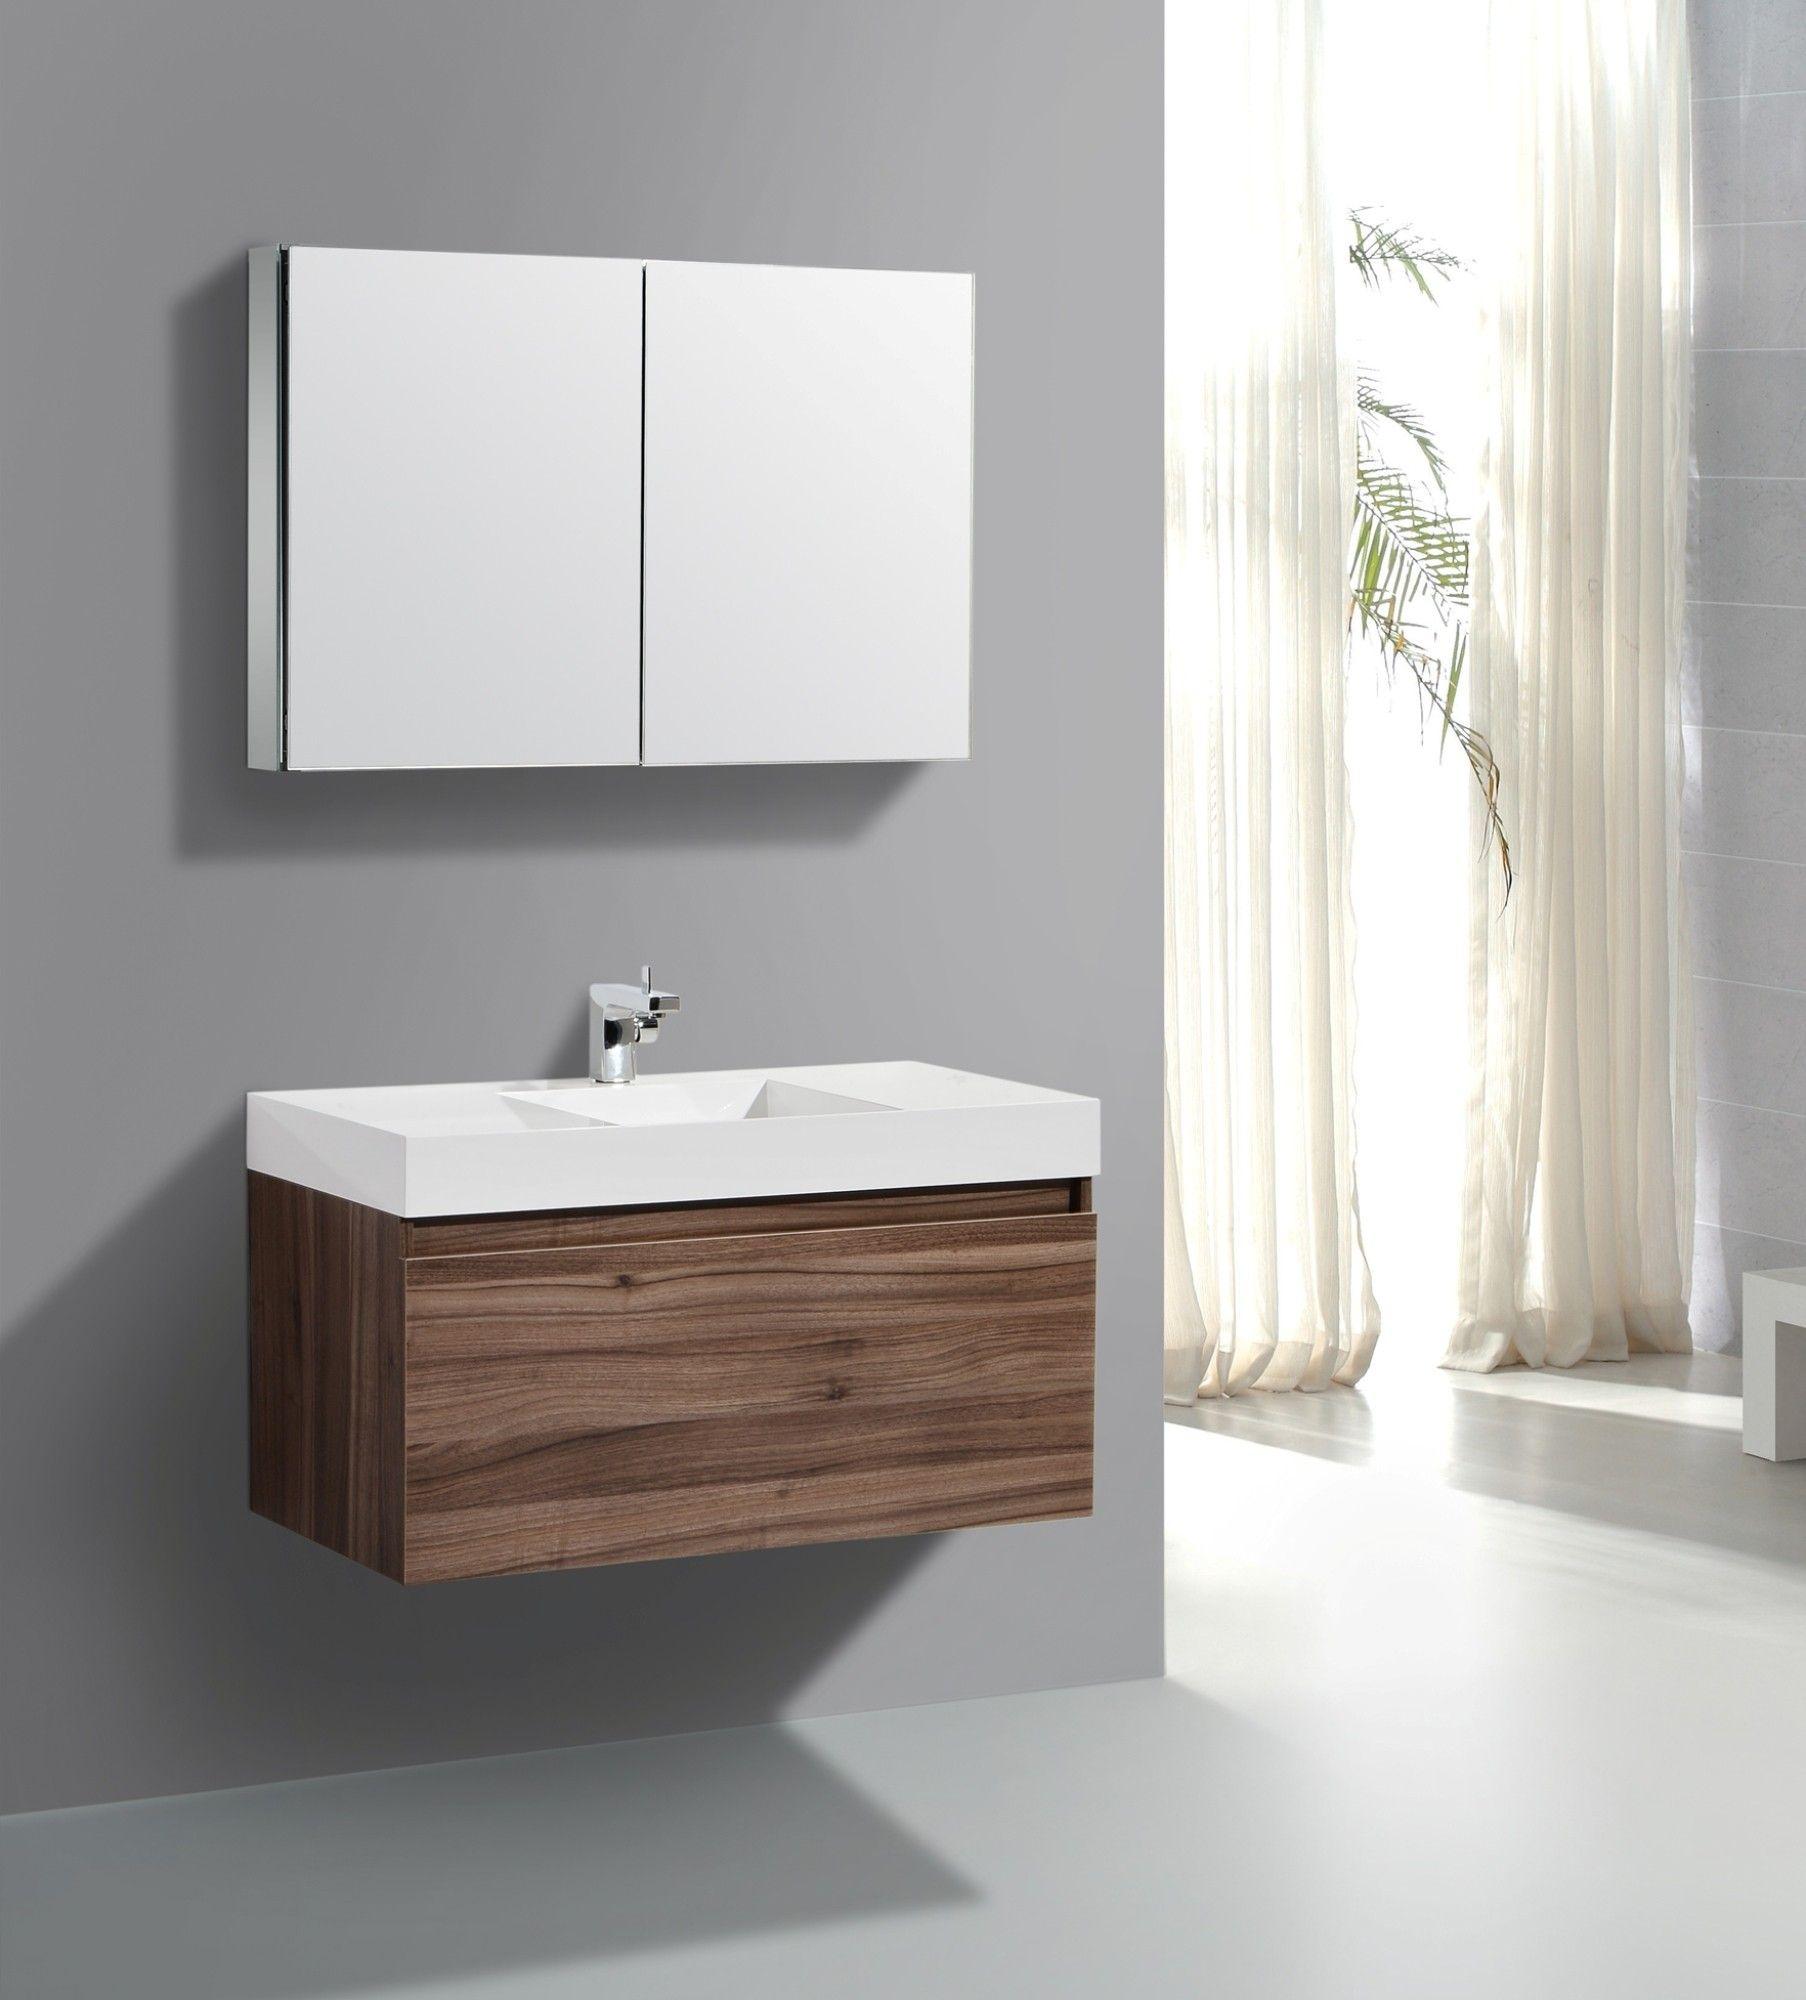 Bathroom Vanities From 36 To 40 Bath Trends Miami Fl